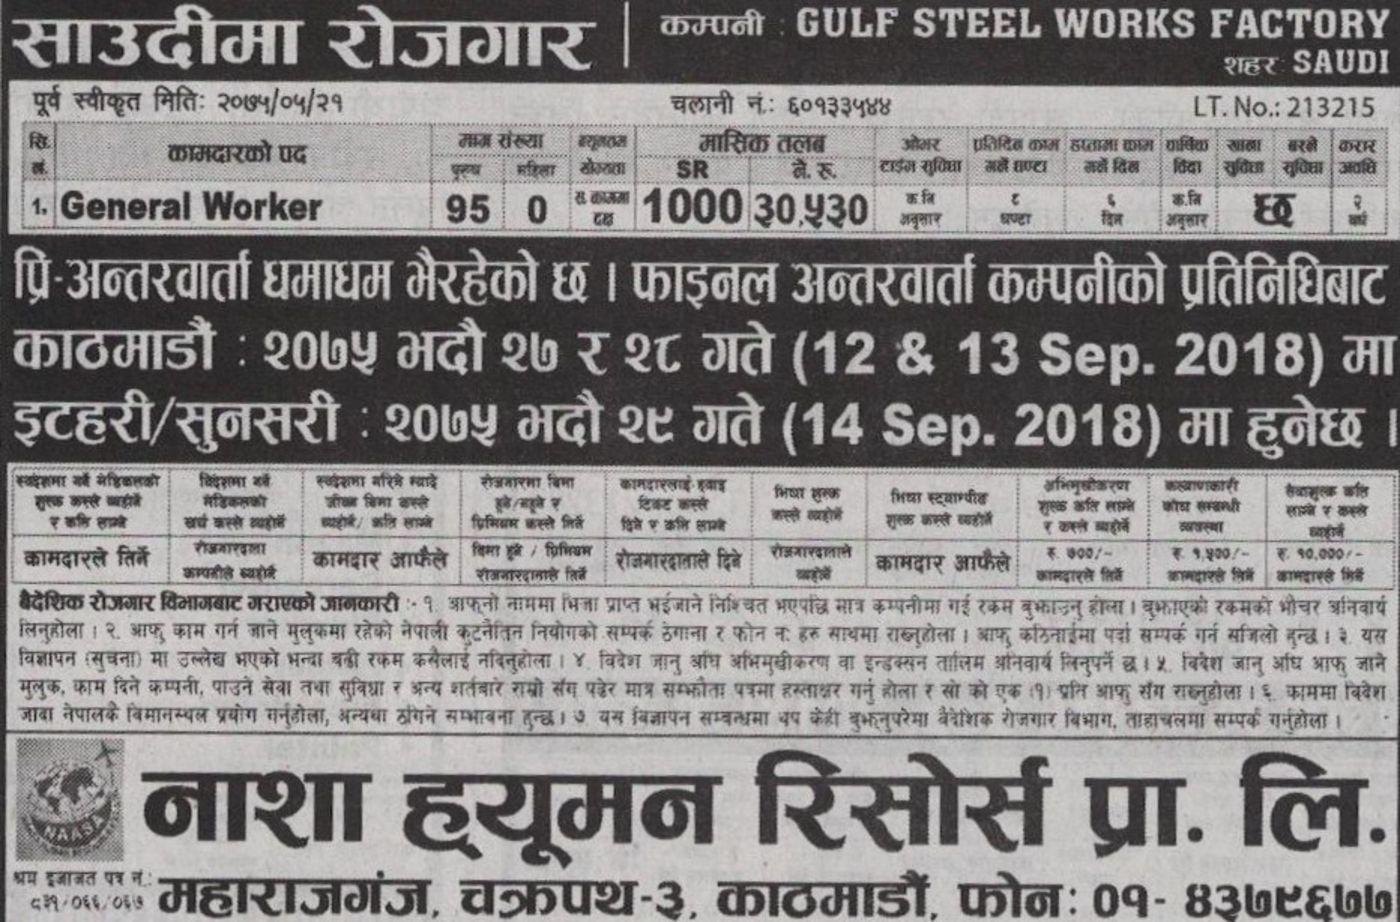 Jobs Nepal - Vacancy - General Worker - Gulf Steel Works